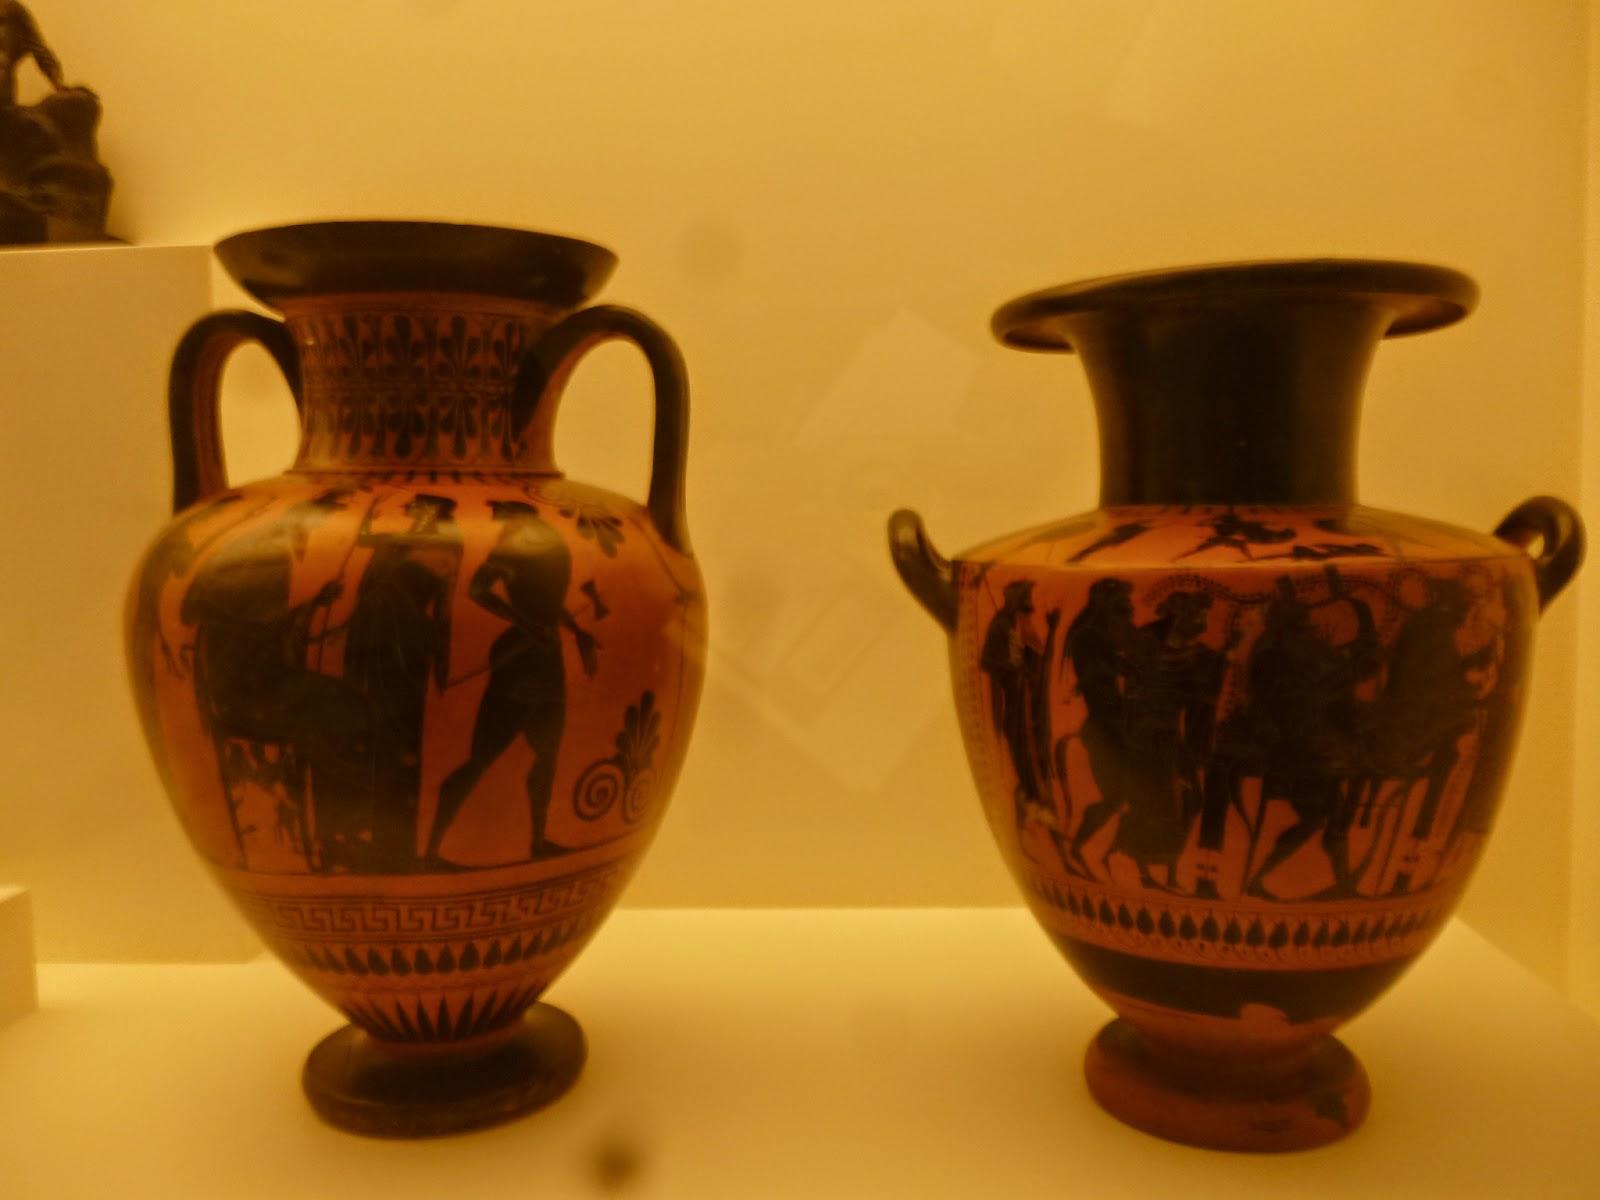 Greek Vases - Bendigo Art Gallery